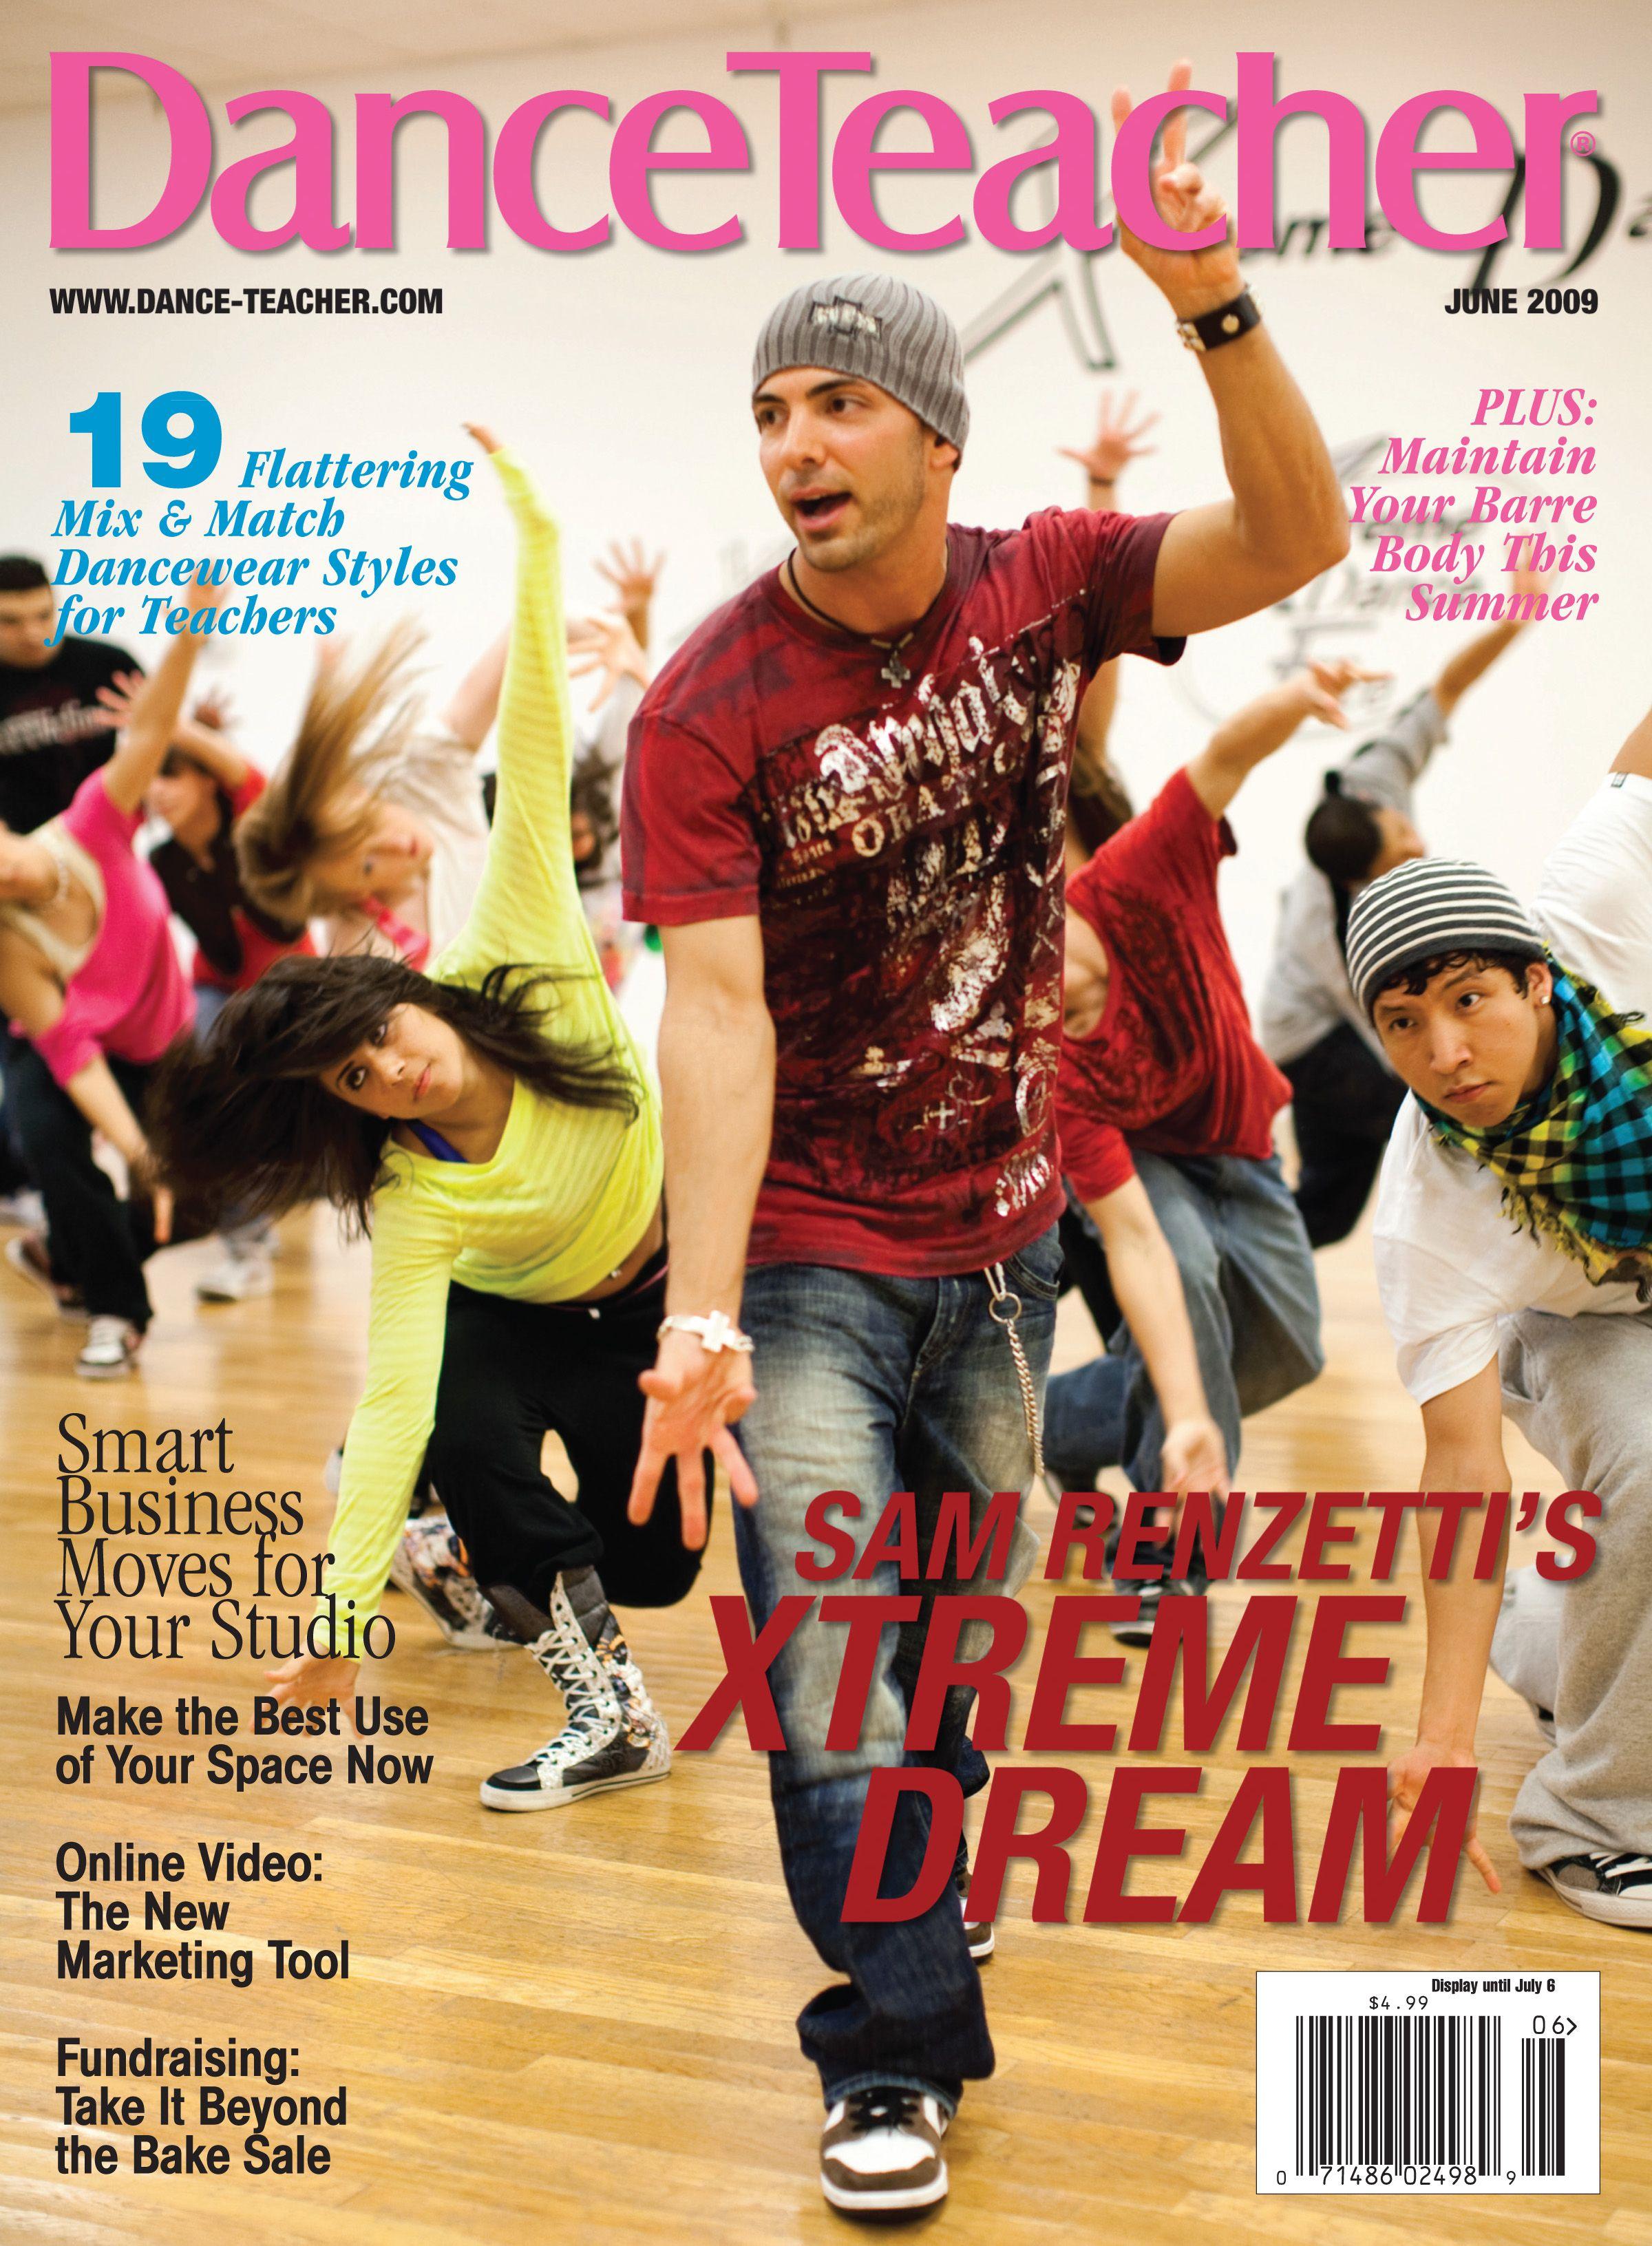 Sam Renzetti of Xreme Dance Center on Dance Teachers June 2009 cover Photo by Kristie Kahns